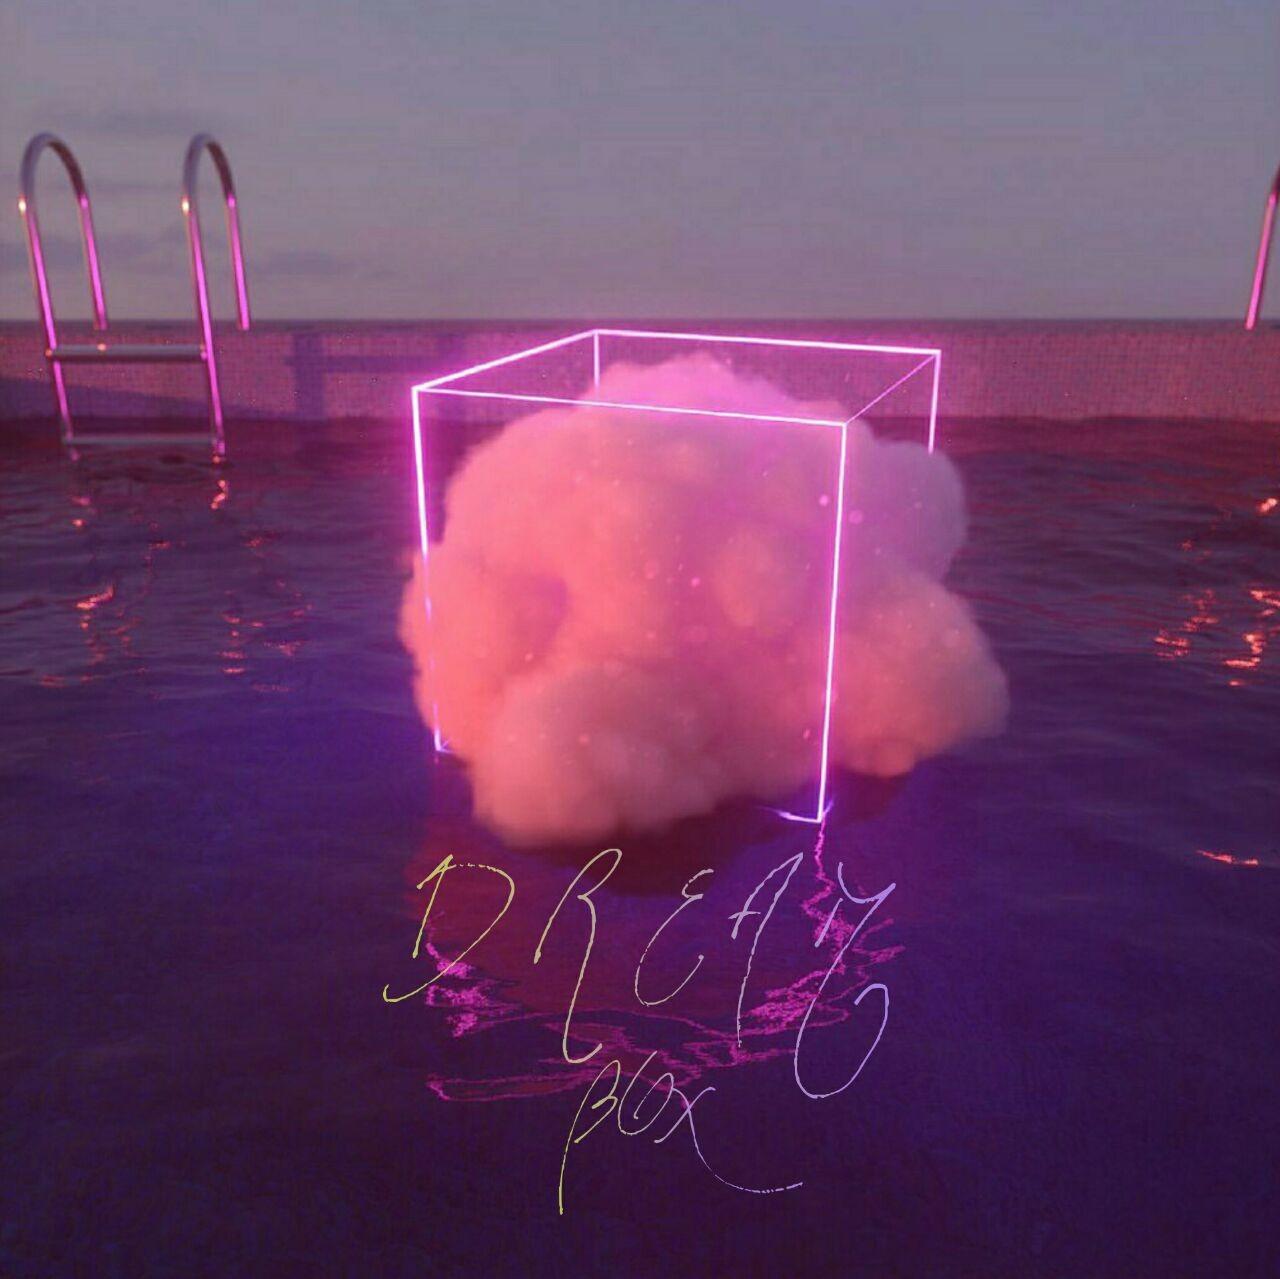 Pouya T4 – Dream Box (Instrumental)